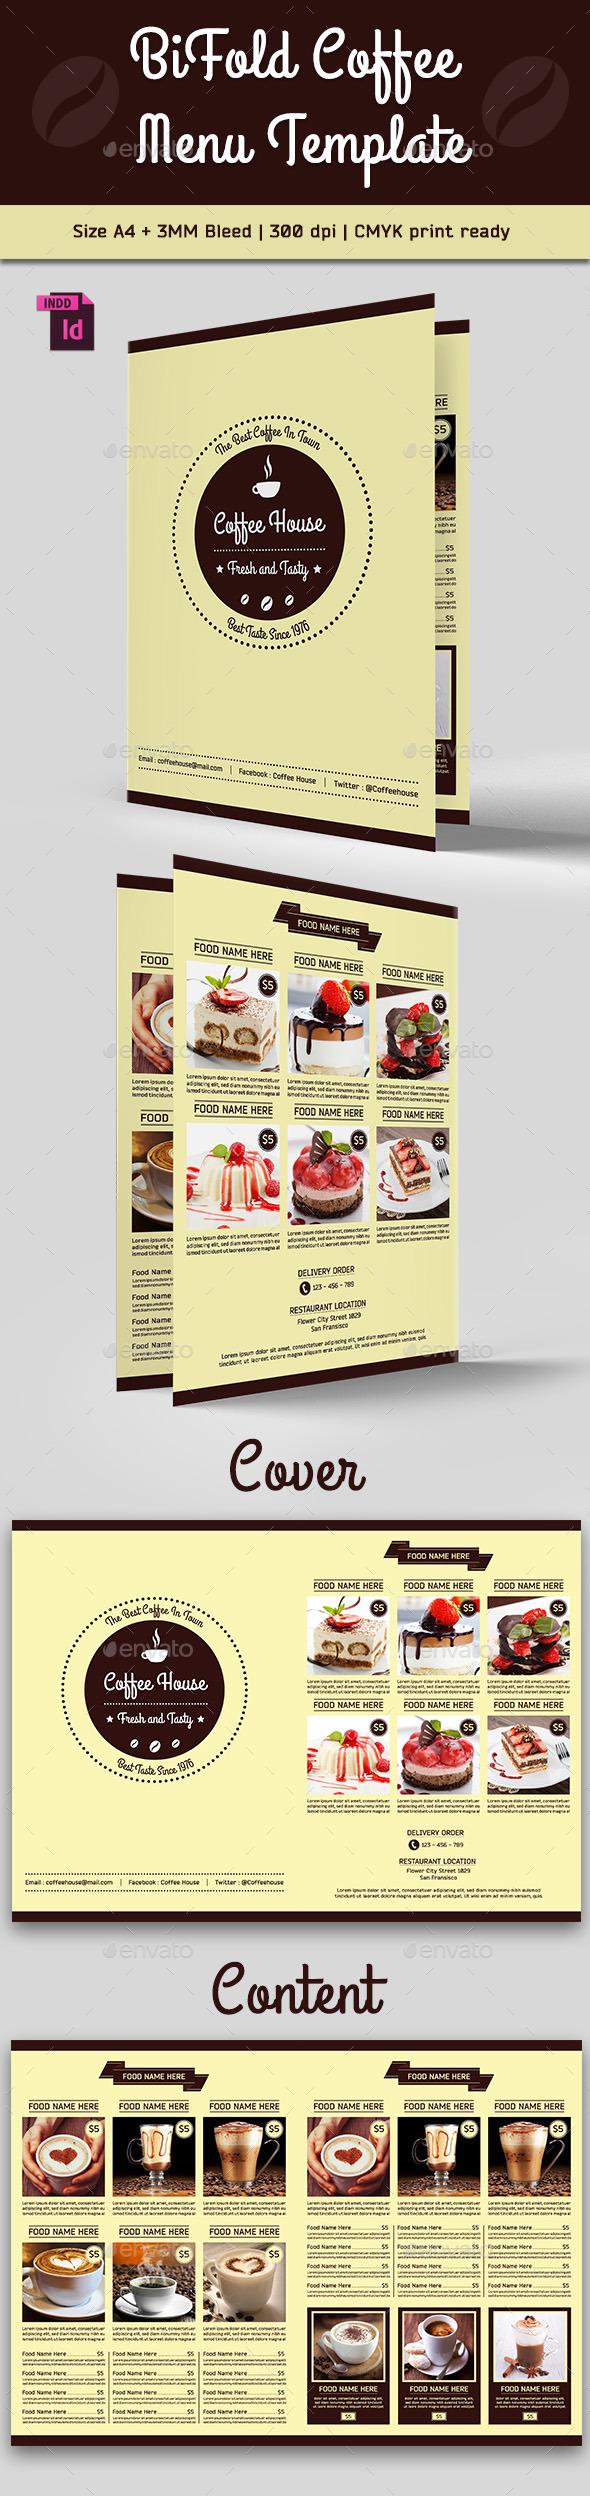 BiFold Coffee Menu Template - Food Menus Print Templates